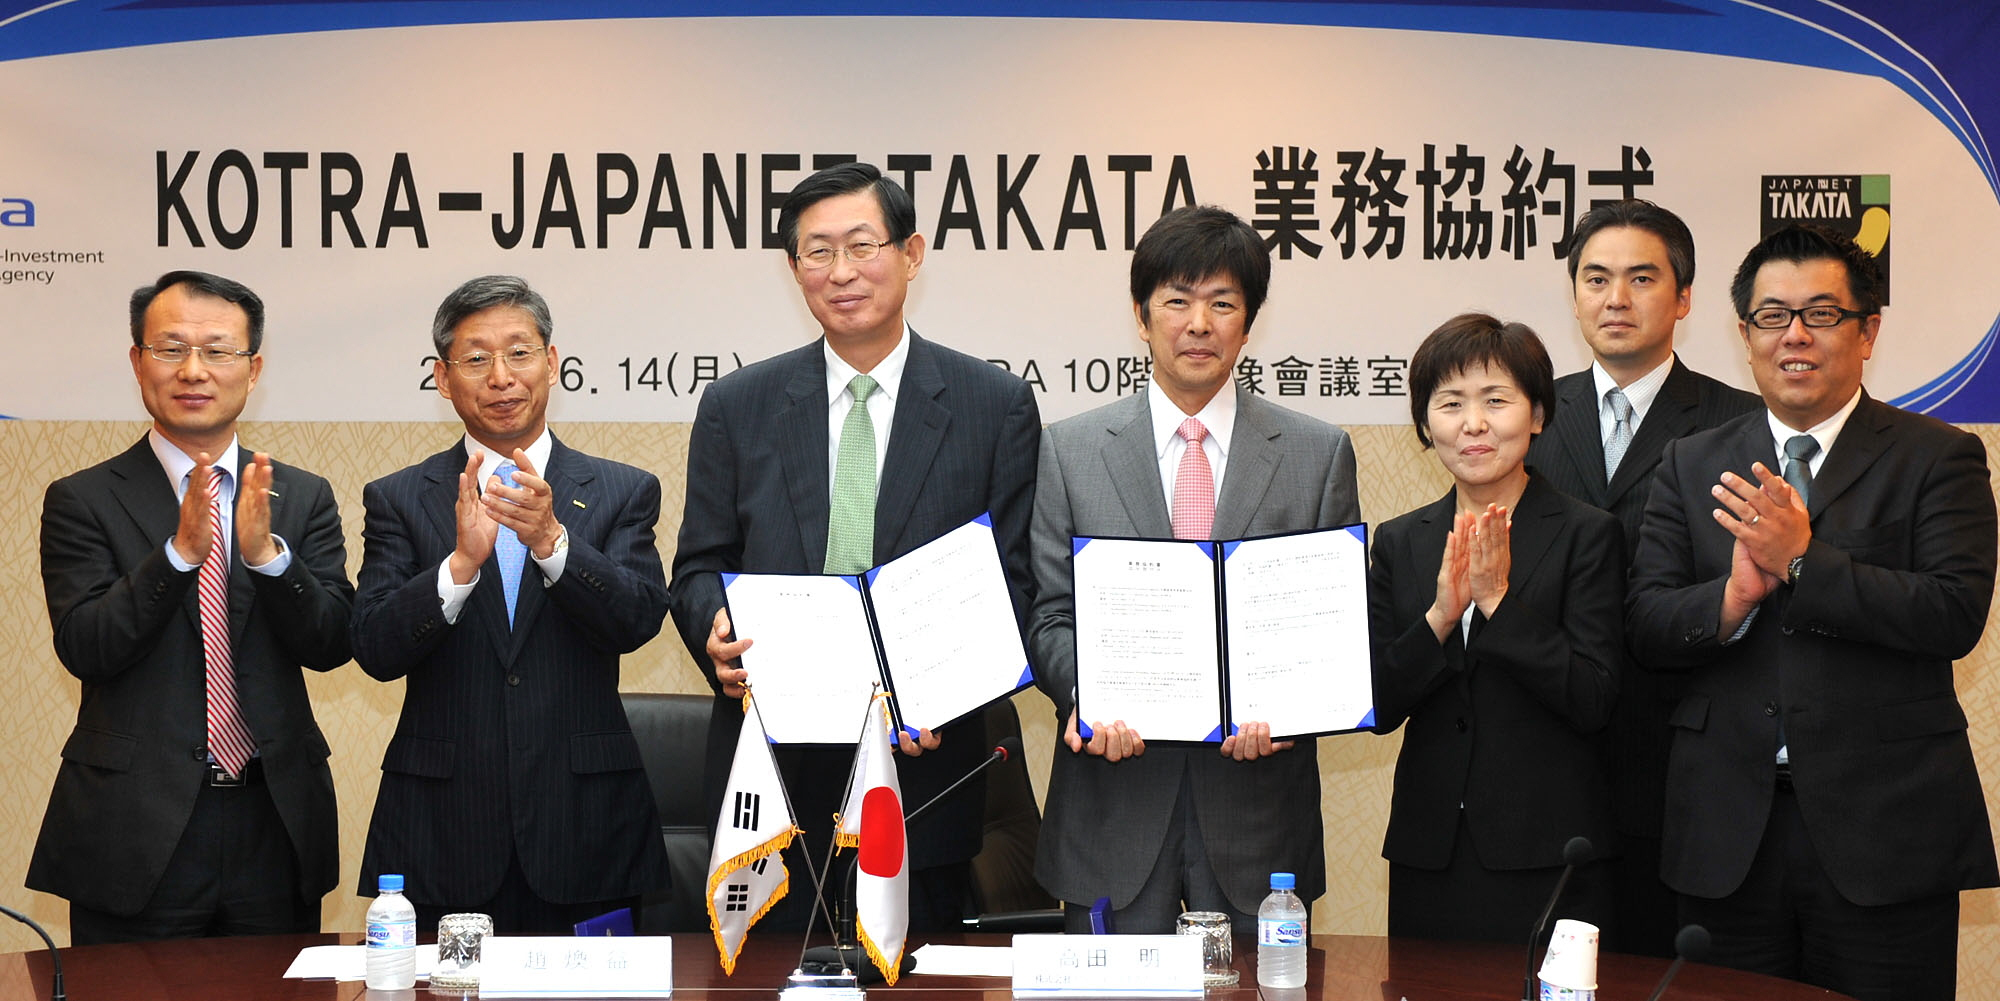 KOTRA, 자파넷다카타와 일본 마케팅 협약